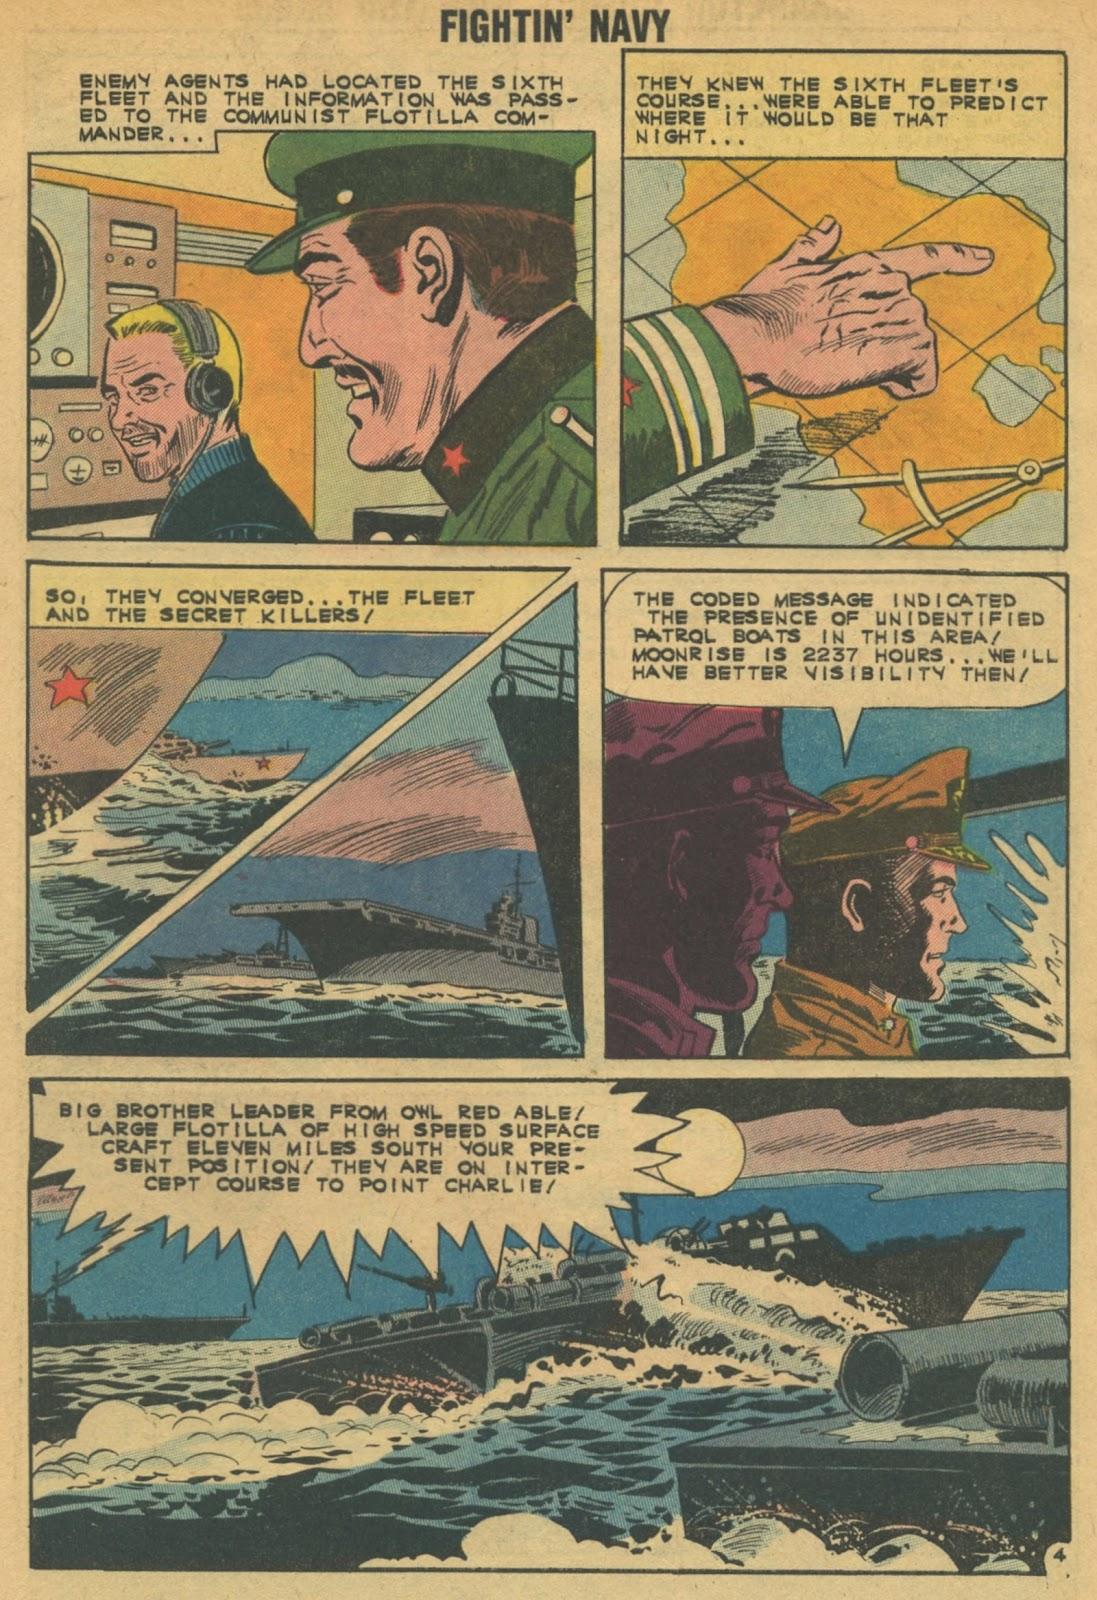 Read online Fightin' Navy comic -  Issue #103 - 28